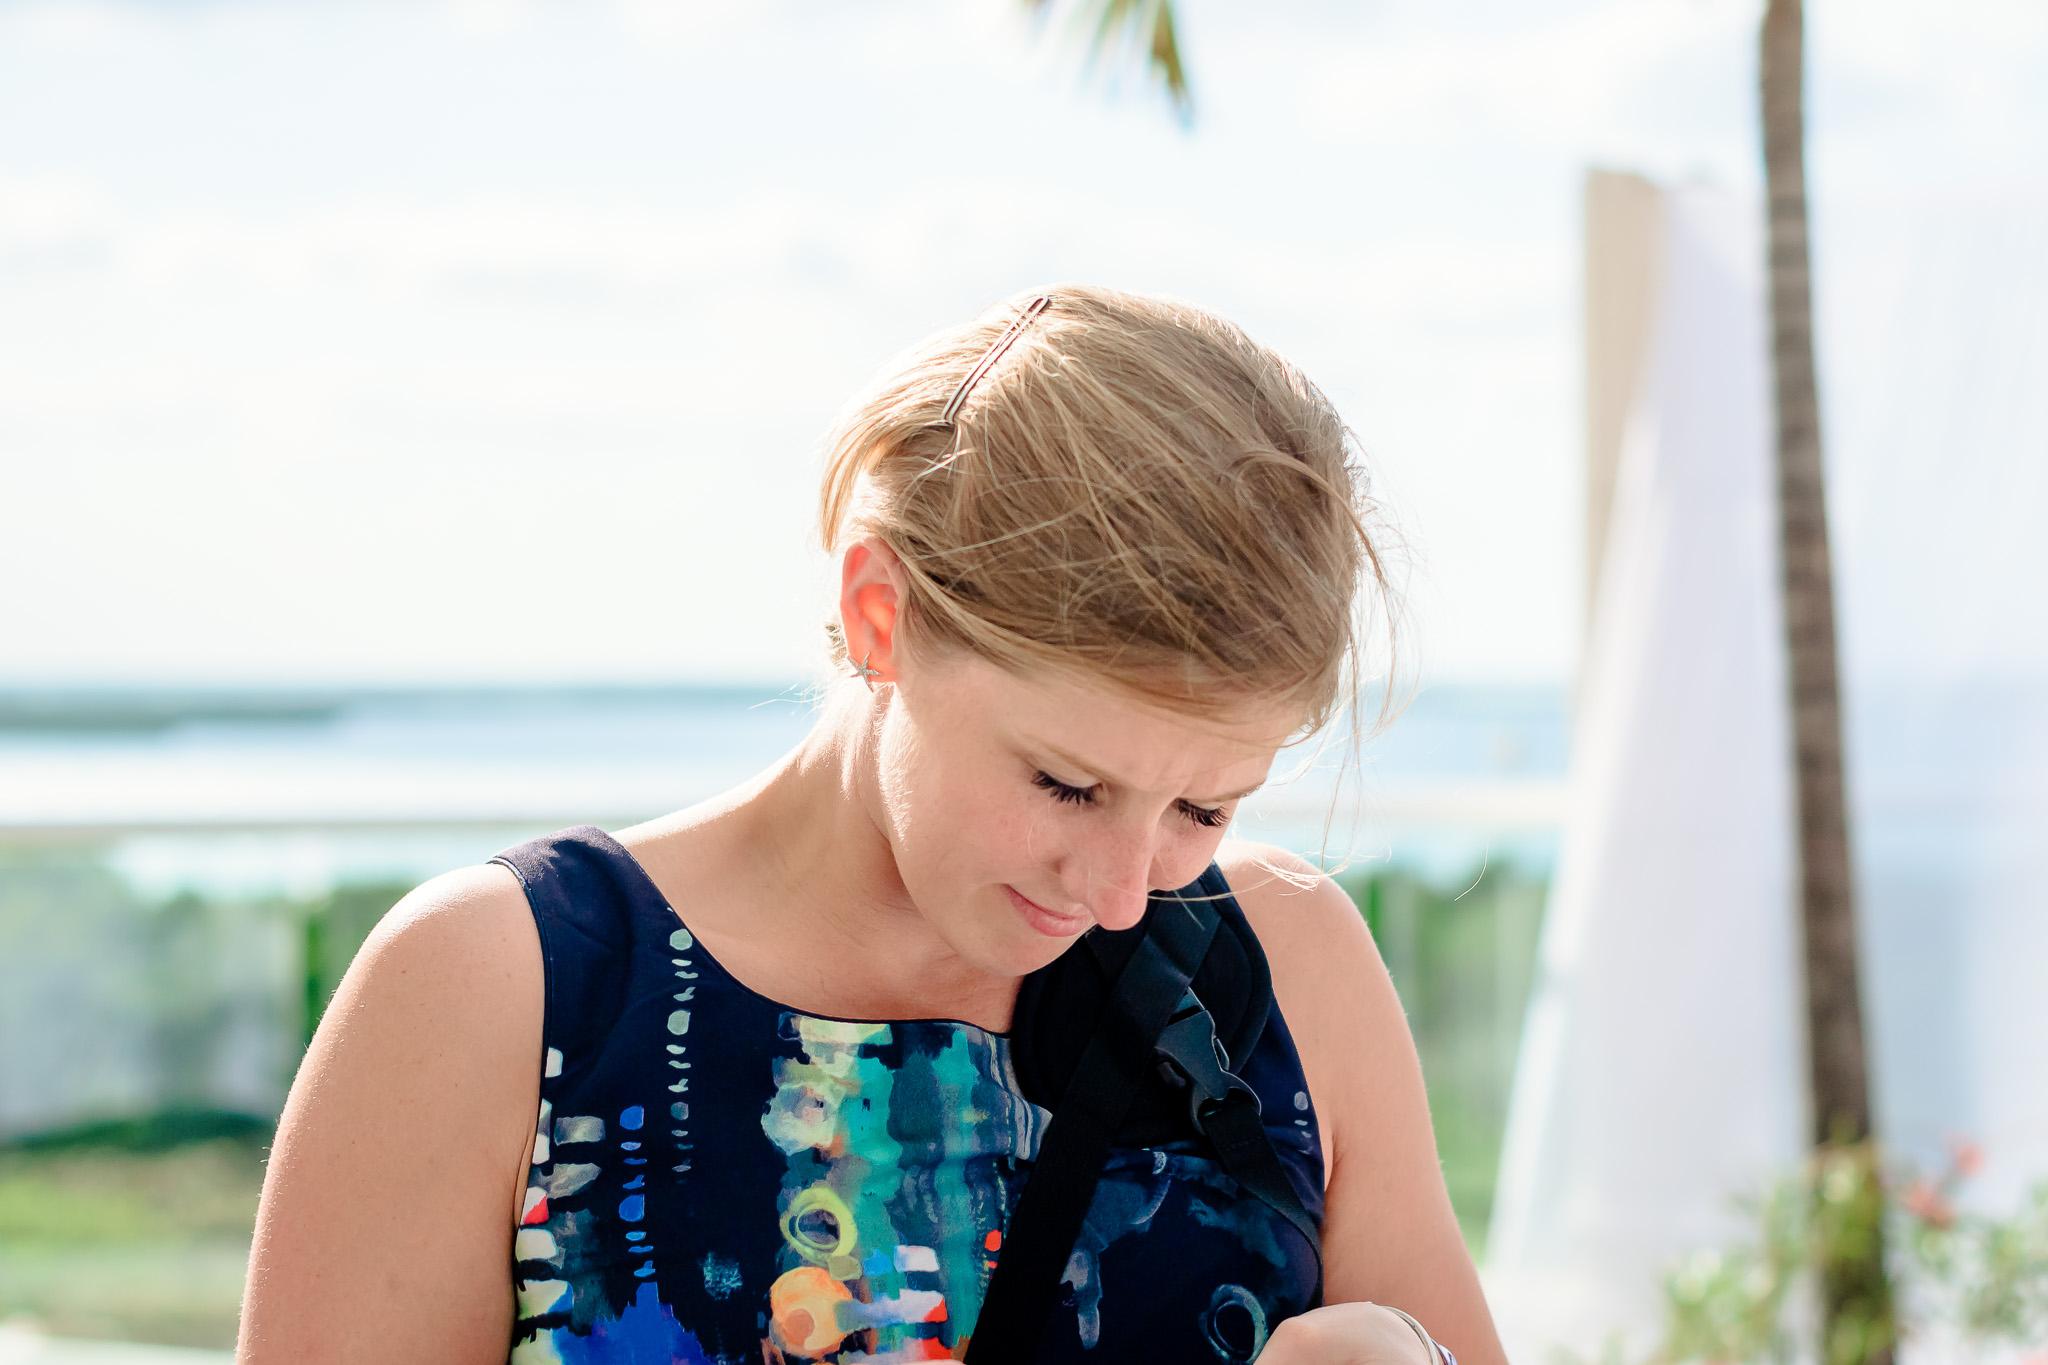 Wedding photographer behind the scenes_Stephanie Kopf Photography